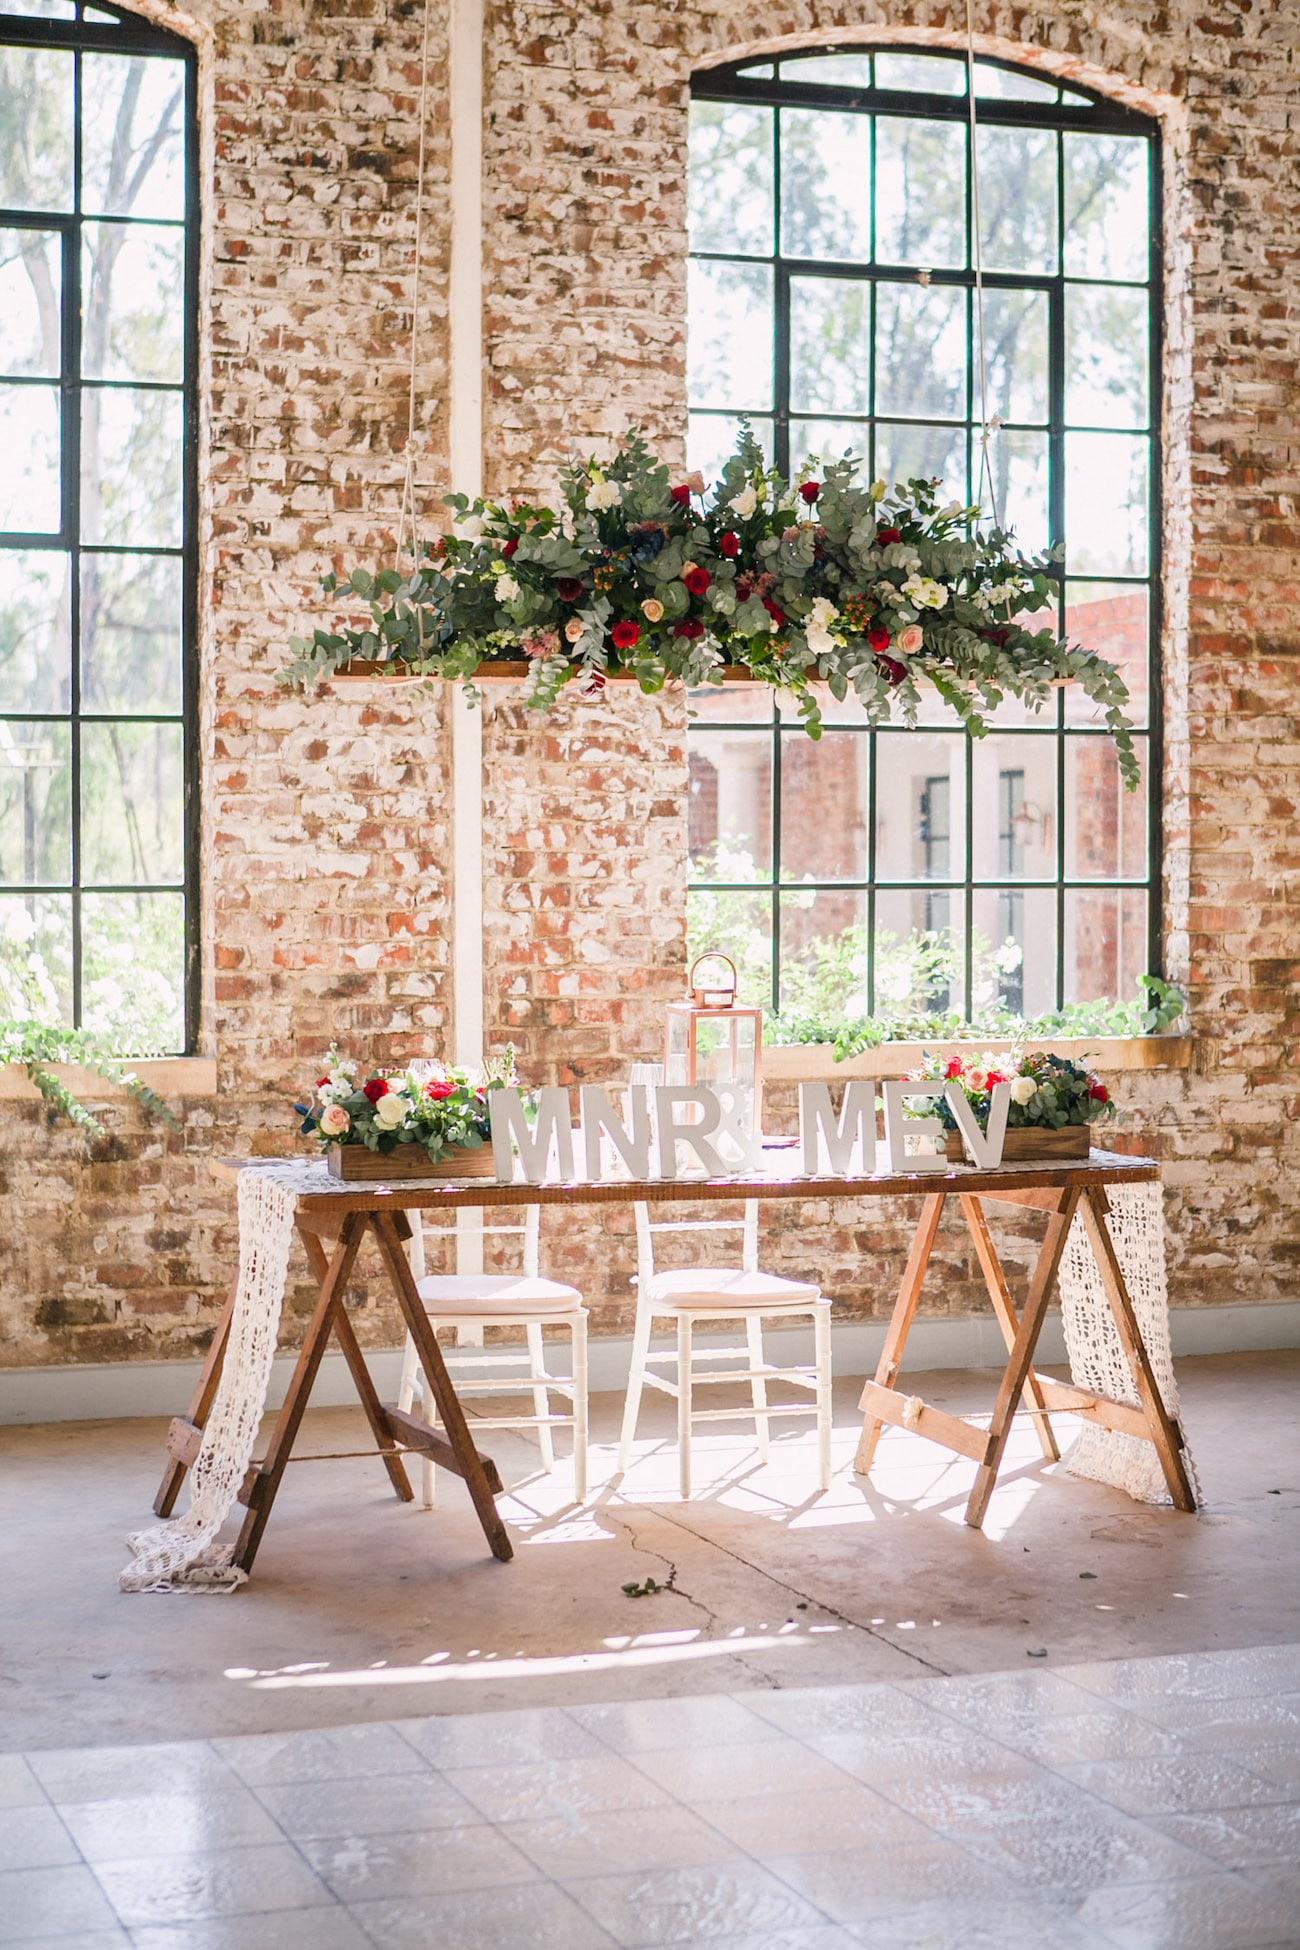 Sweetheart Table | Joyous Jewel Tone Winter Wedding | Credit: Dust and Dreams Photography